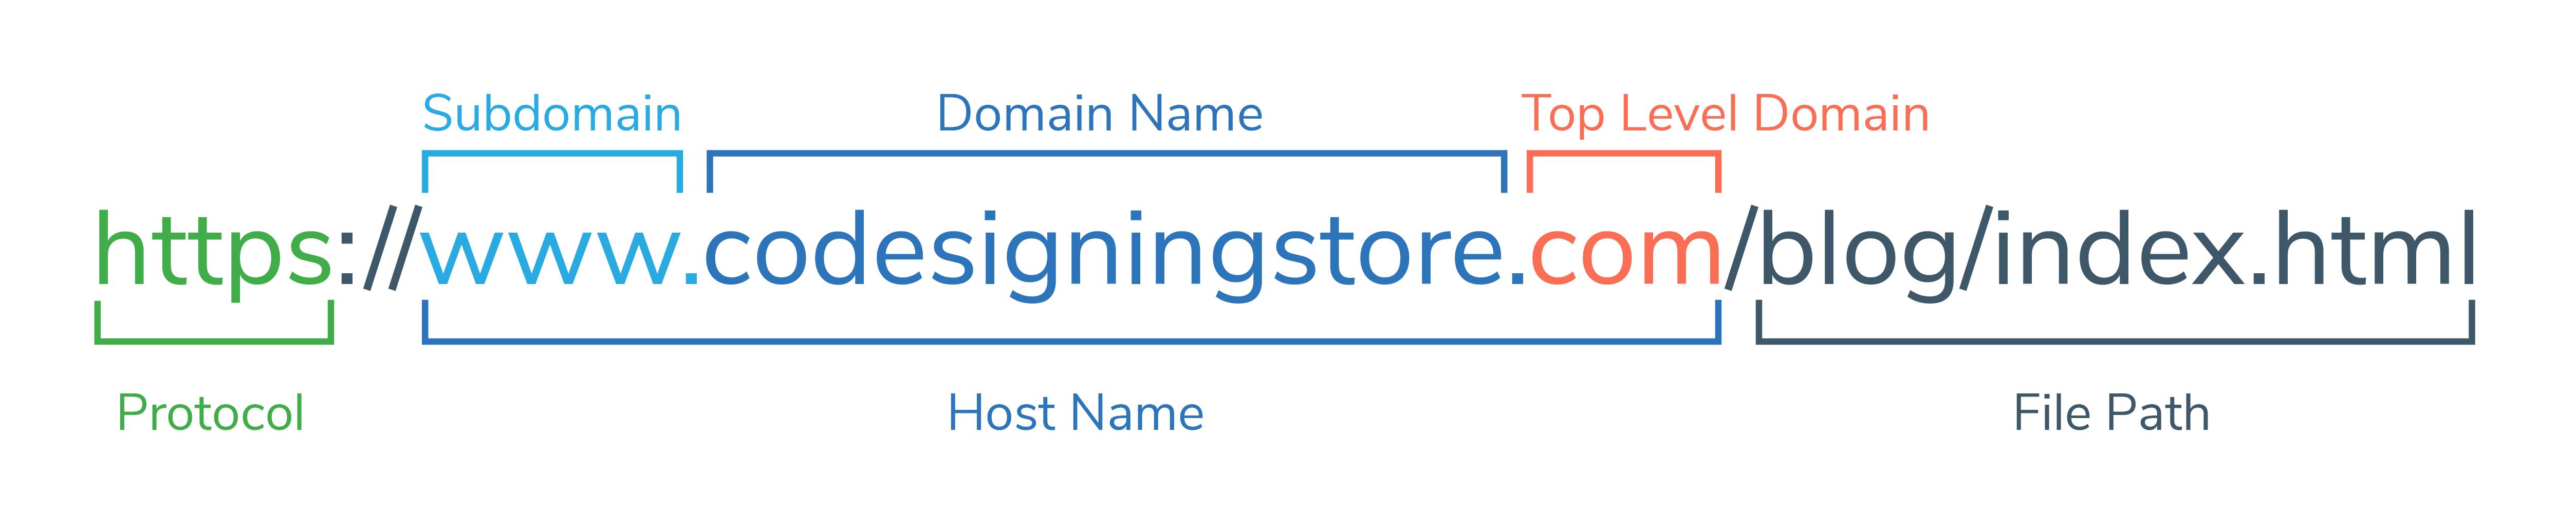 Example of a URL breakdown